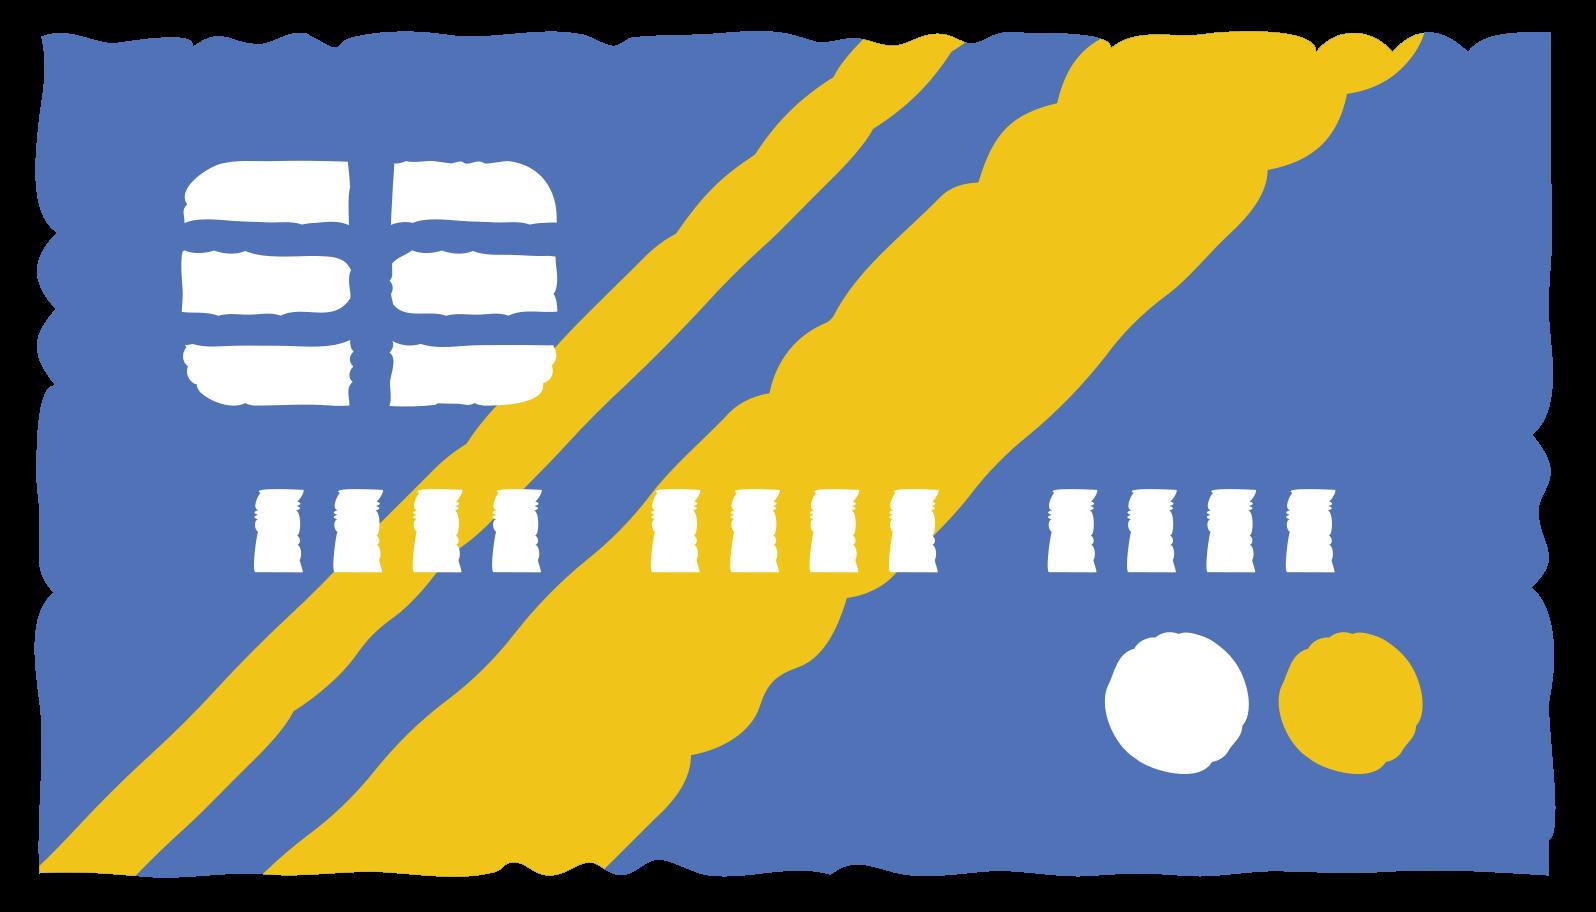 credit card front Clipart illustration in PNG, SVG